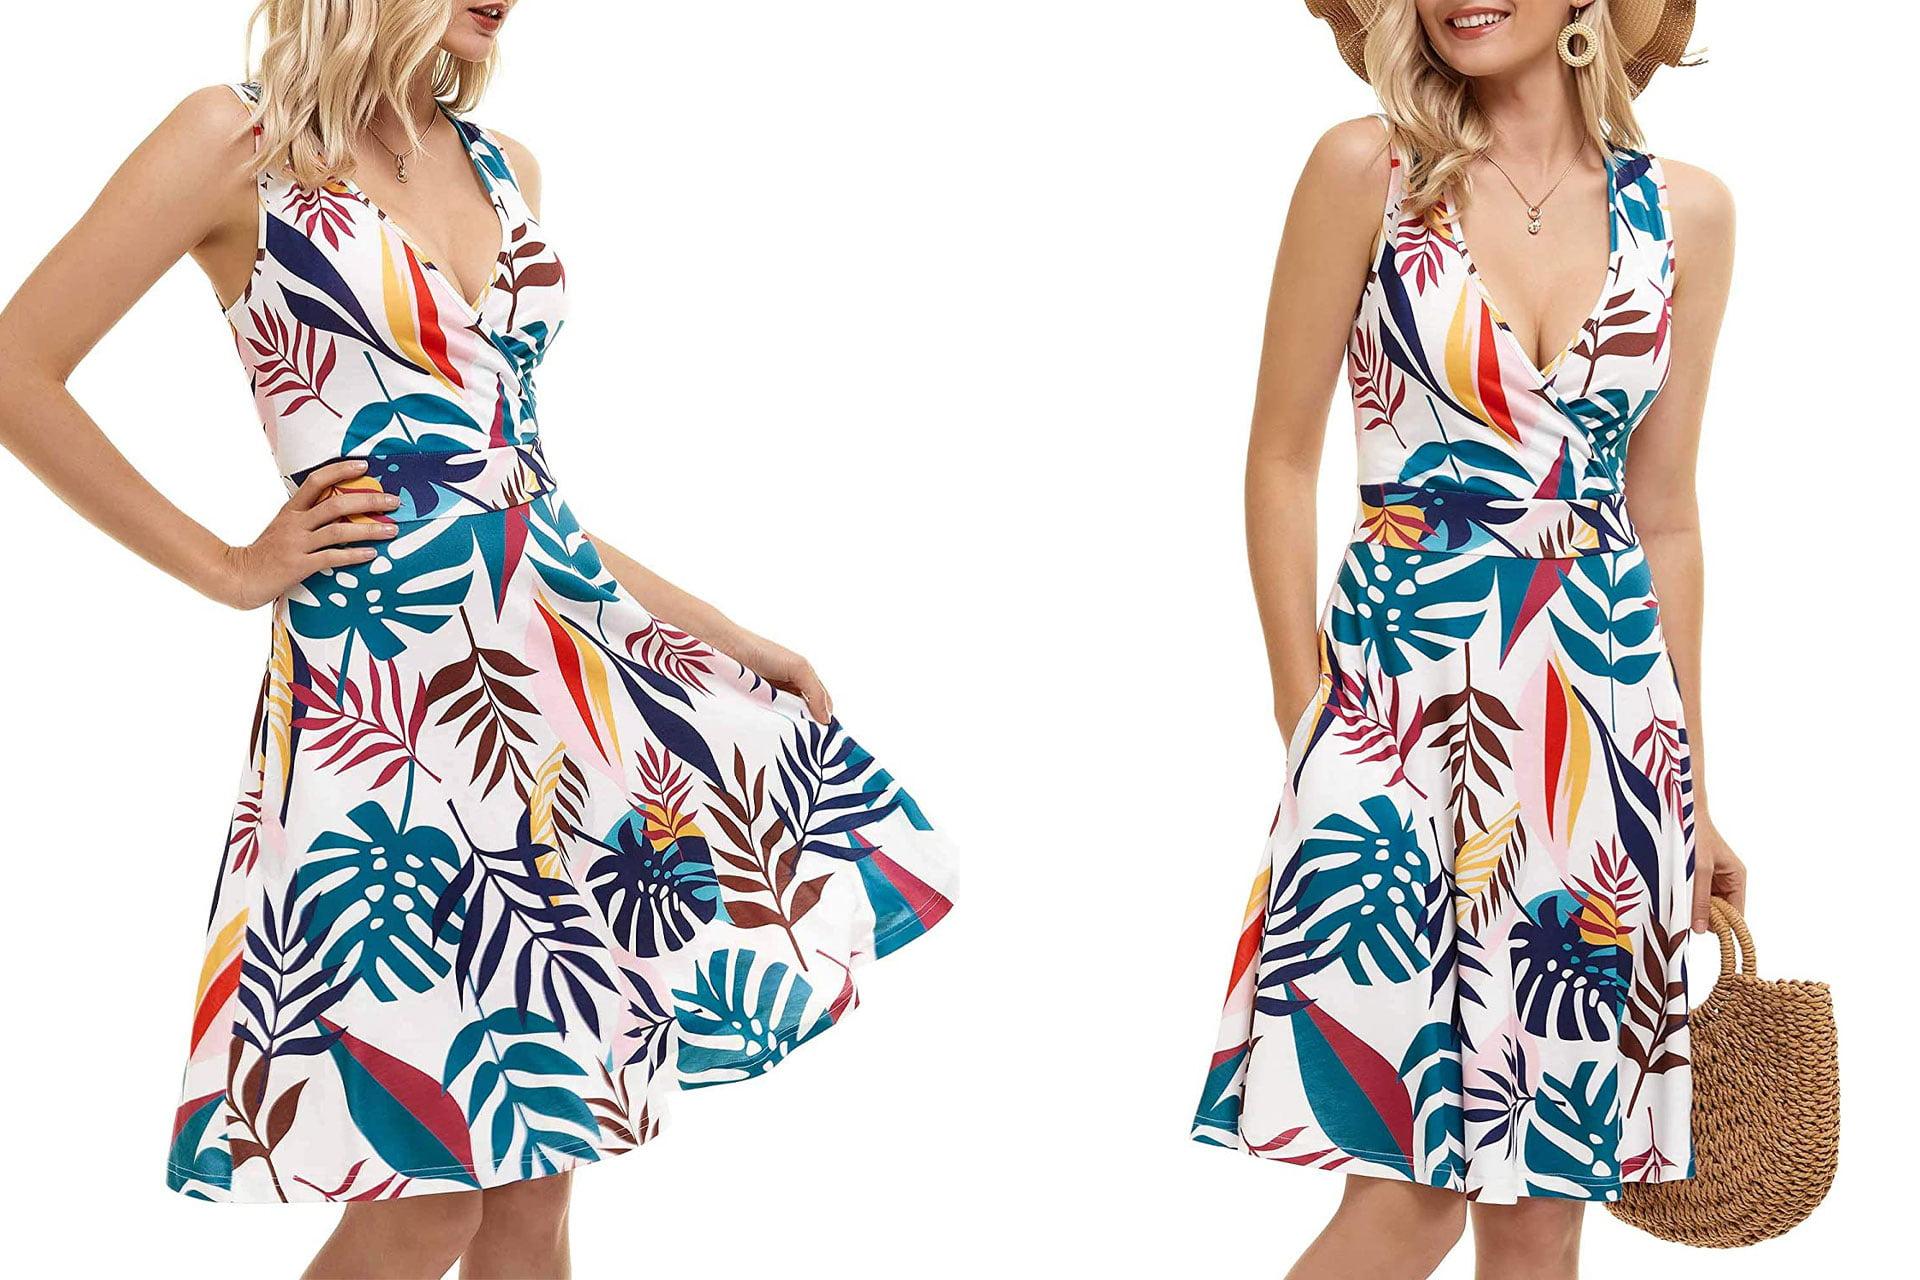 GUBERRY Women's Wrap V Neck Sleeveless Sundress Summer Flare Tank Dress with Pockets